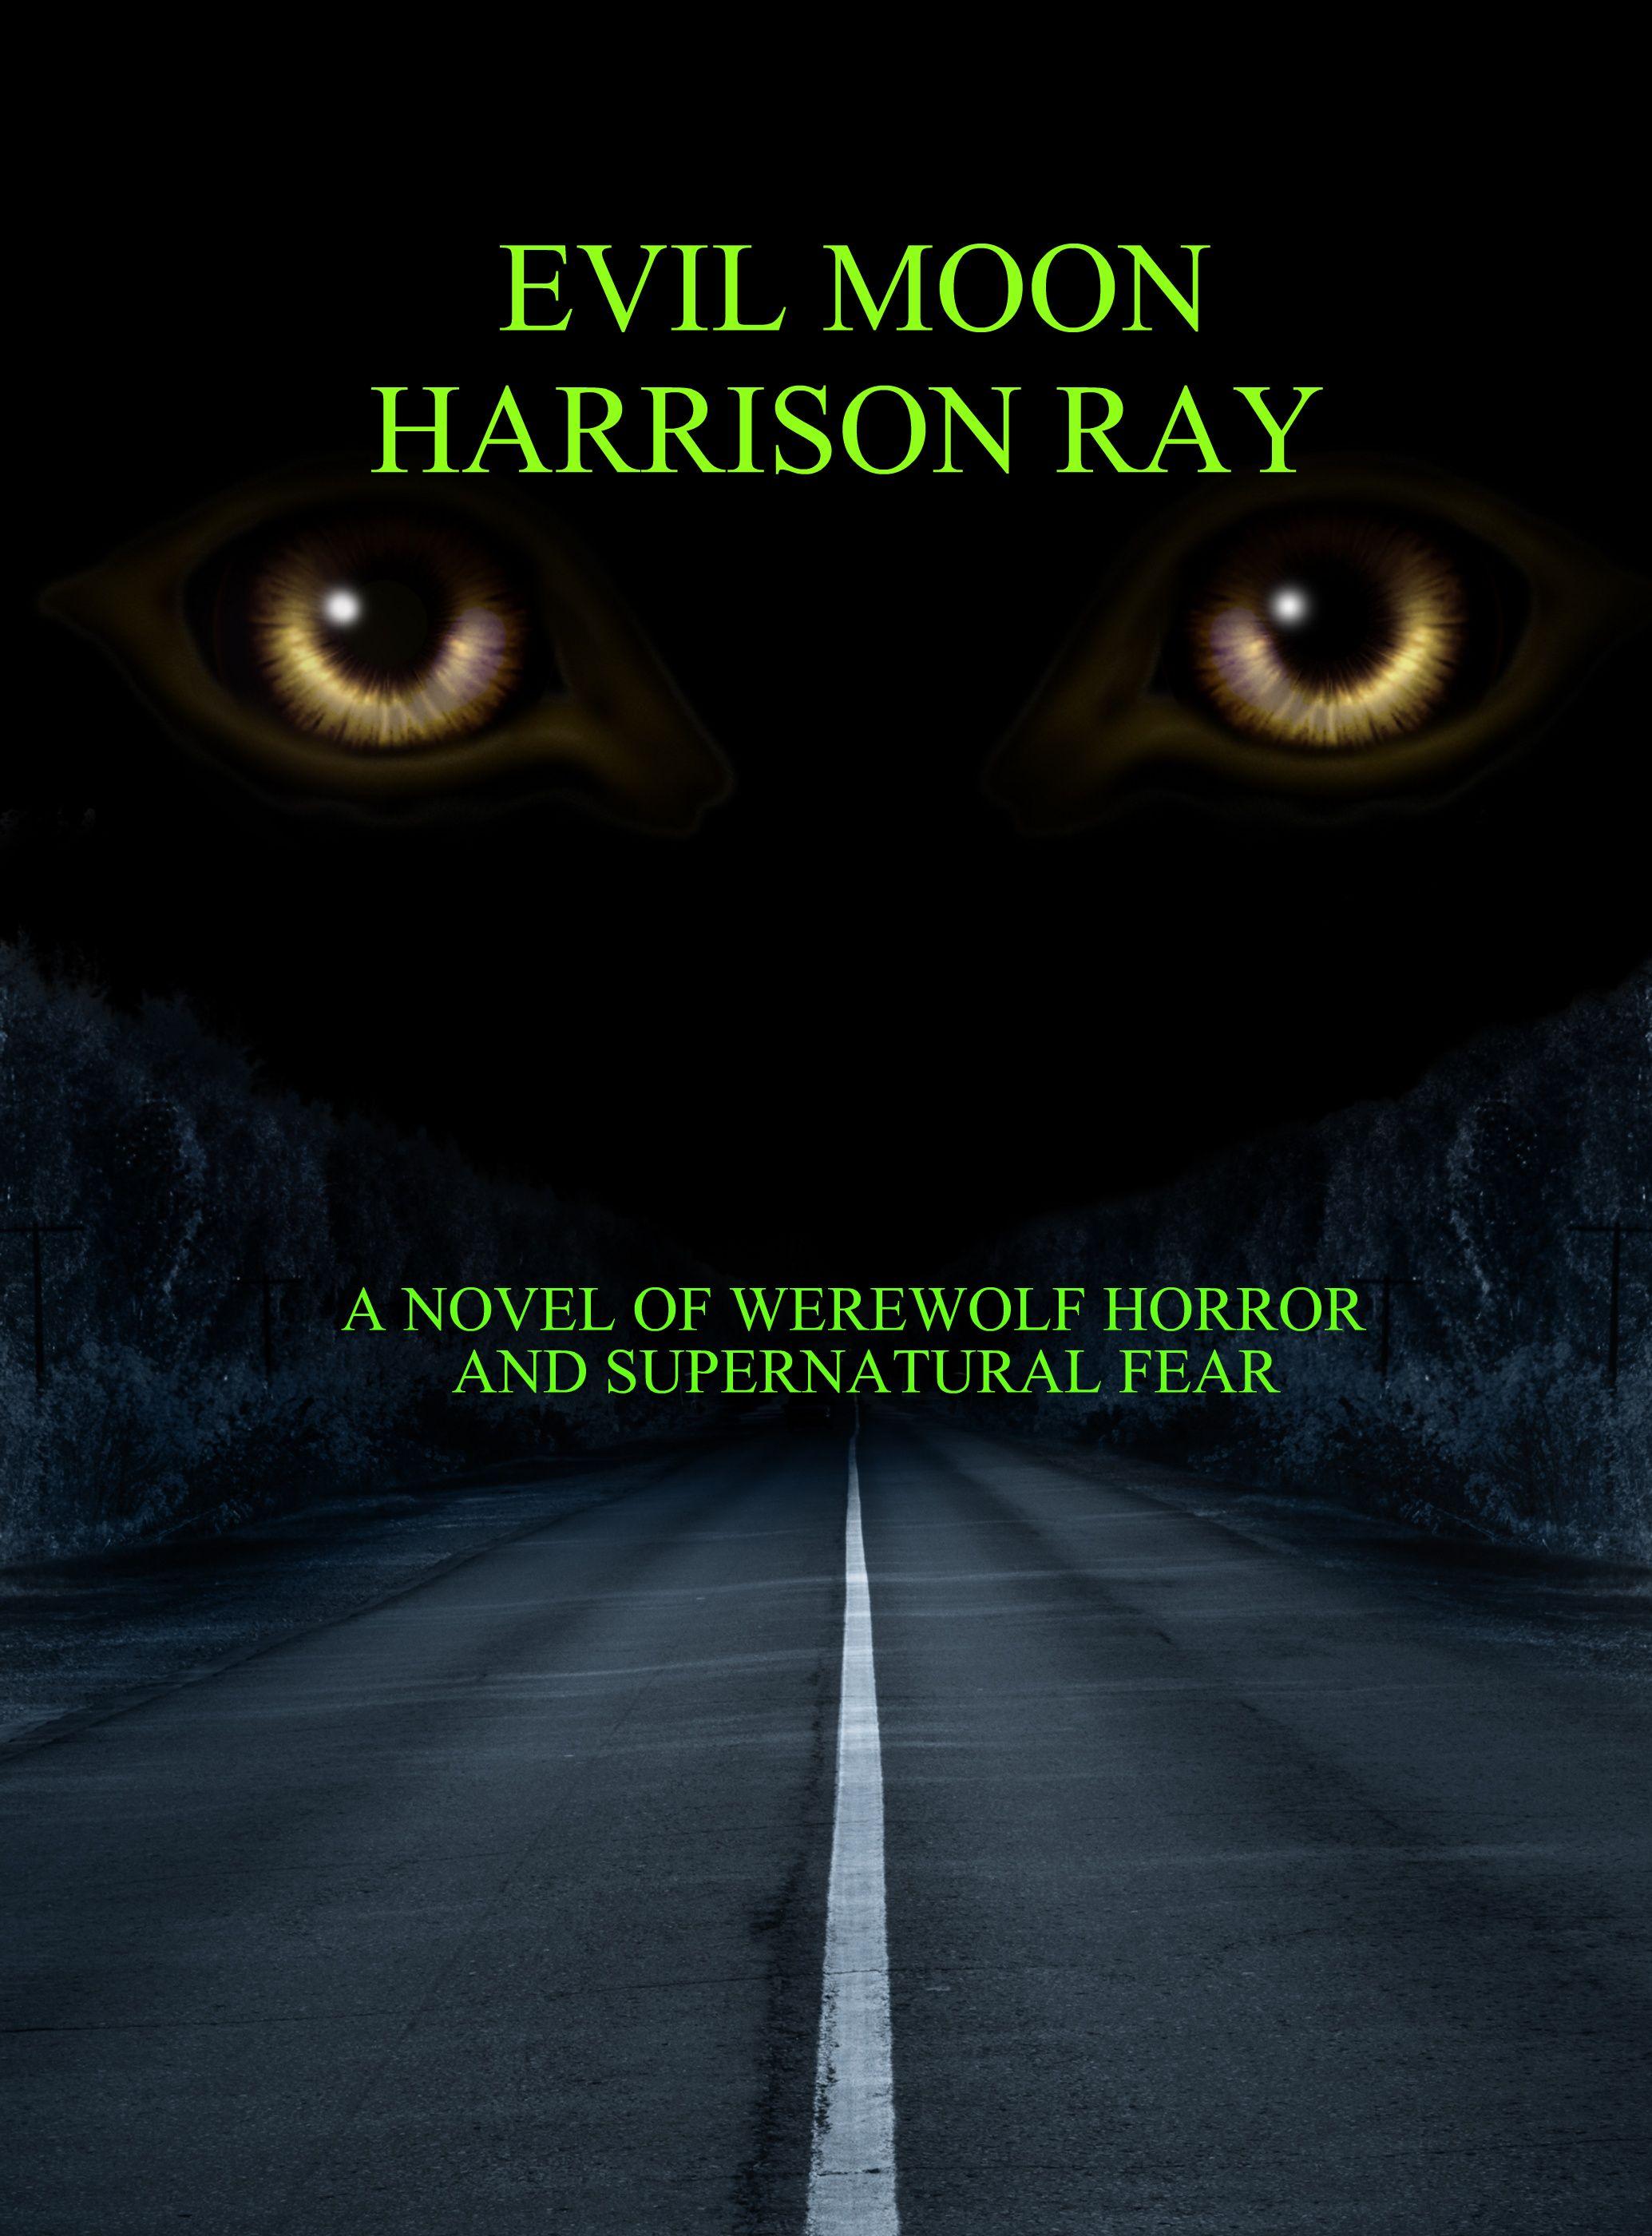 EVIL MOON A novel of werewolf horror and supernatural fear.